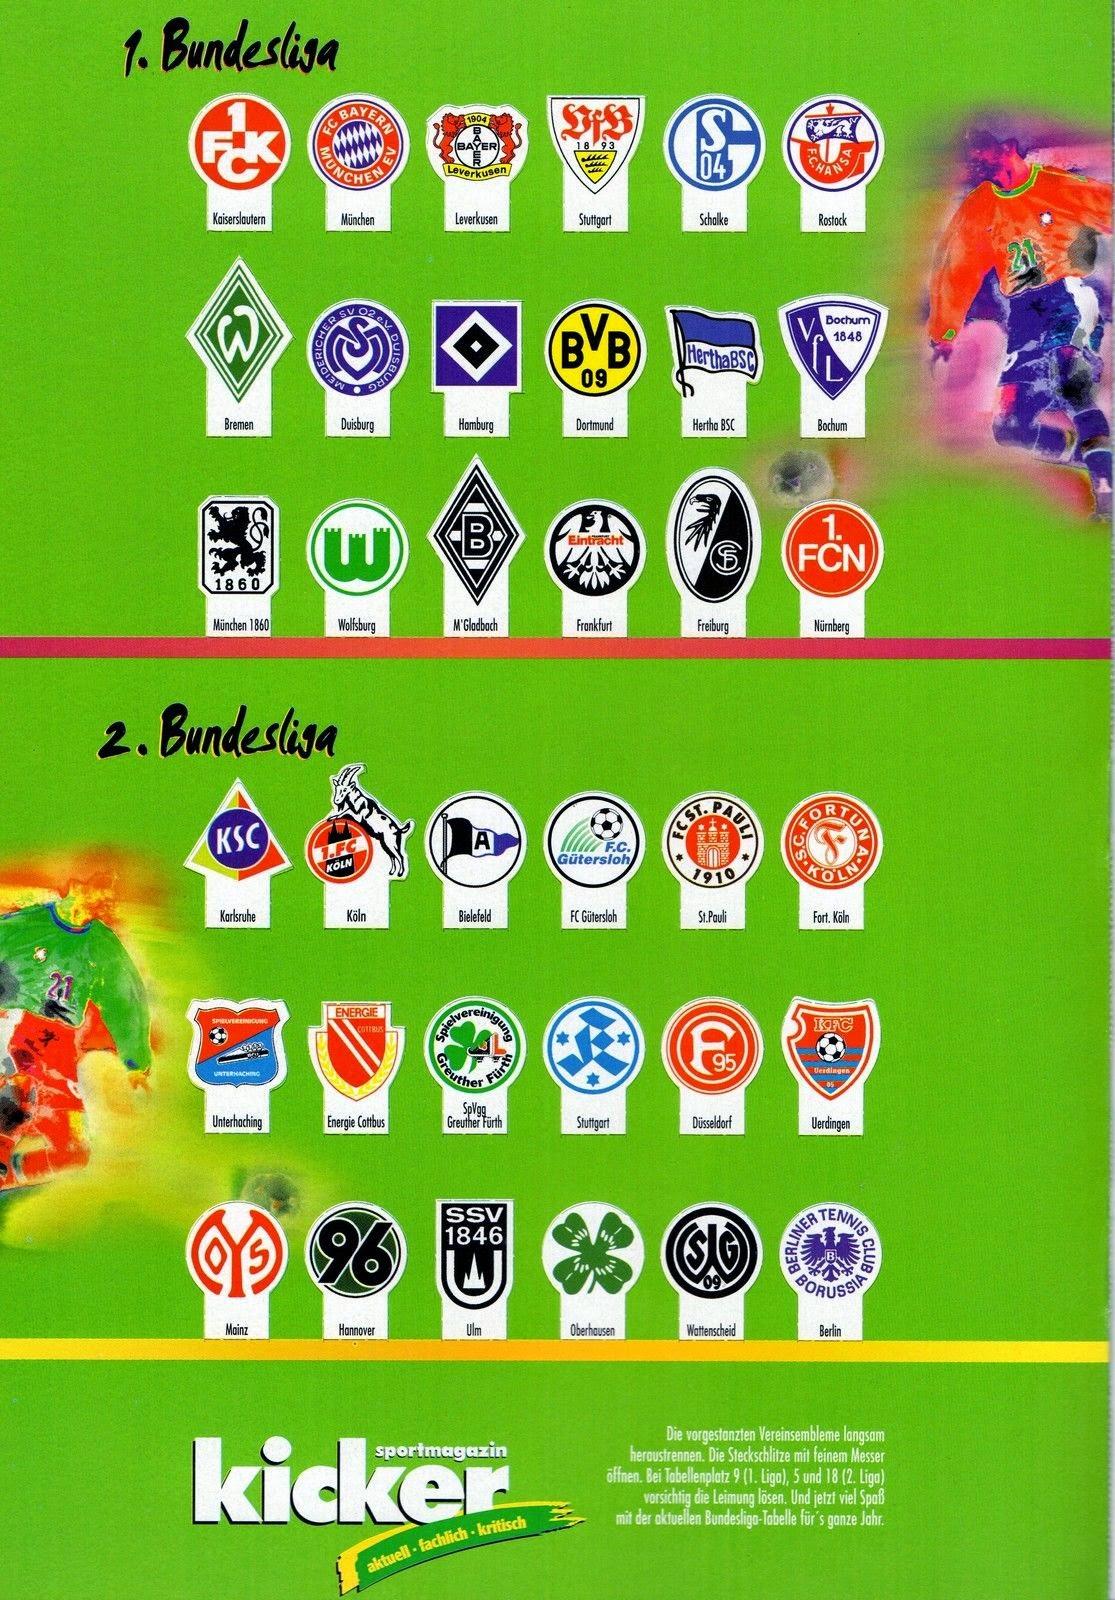 Kicker Bundesliga 2